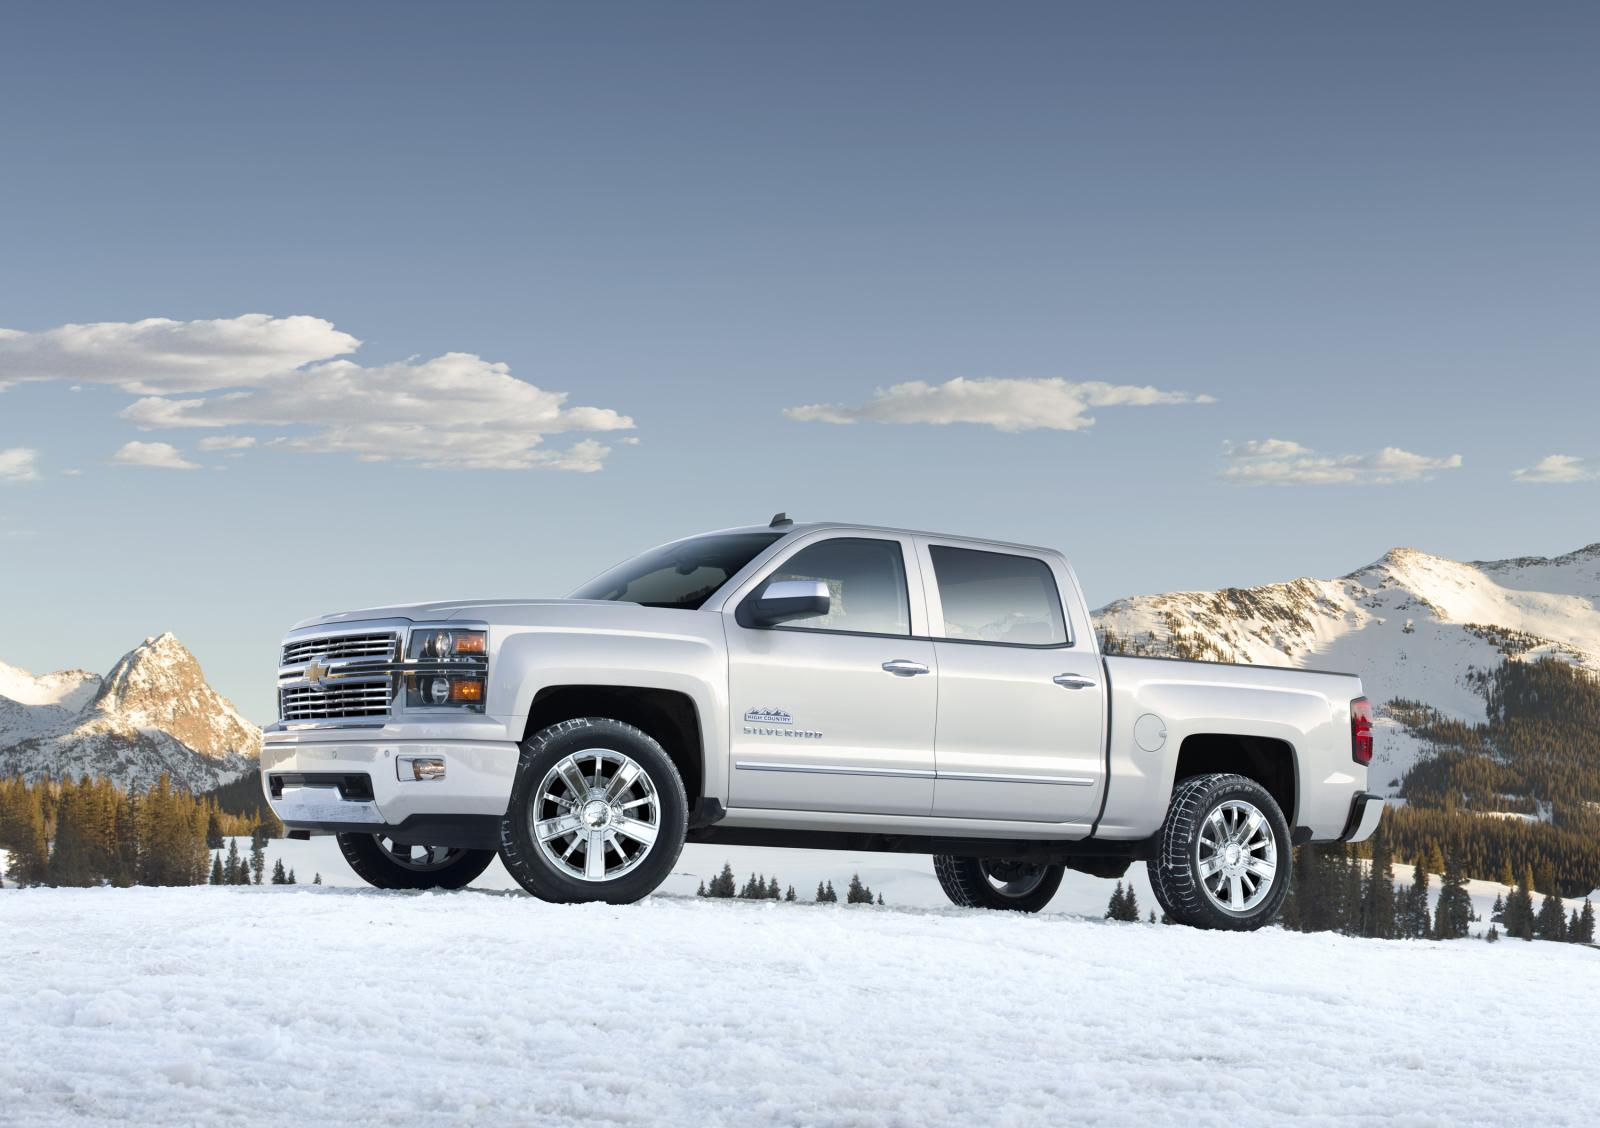 Gmc High Country Options >> 2014 Chevrolet Silverado High Country Unveiled Autoevolution